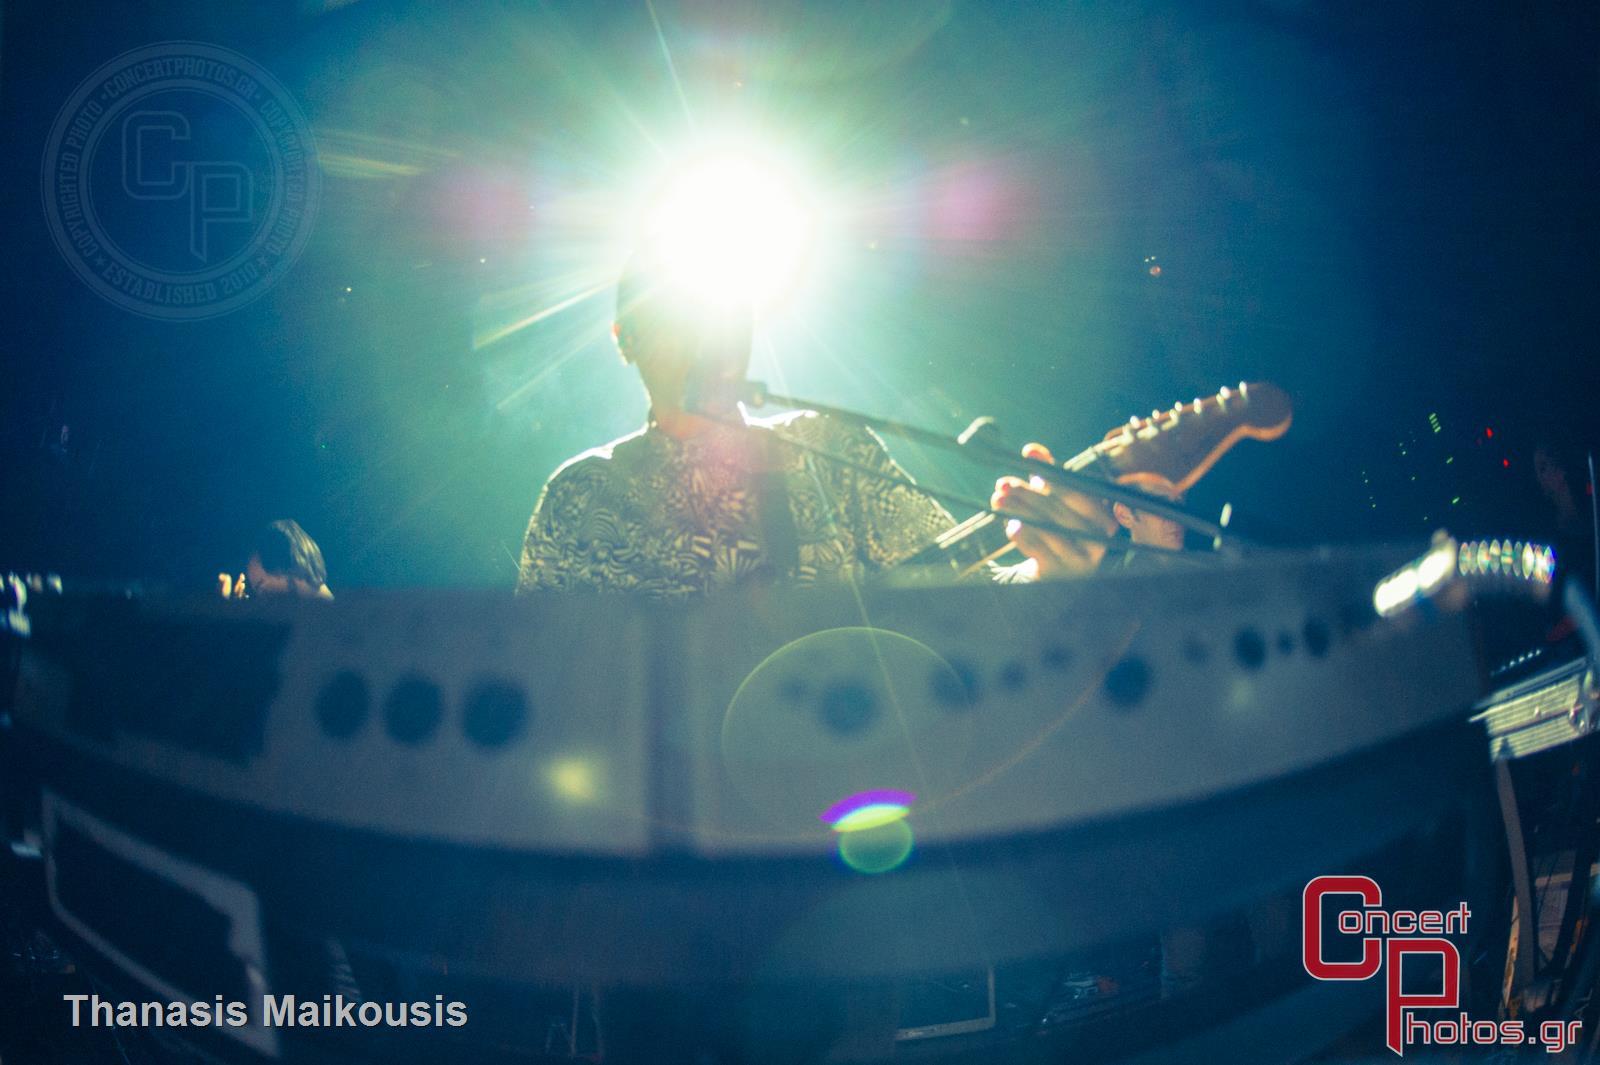 Tricky - Spectralfire-Tricky - Spectralfire photographer: Thanasis Maikousis - concertphotos_-3456